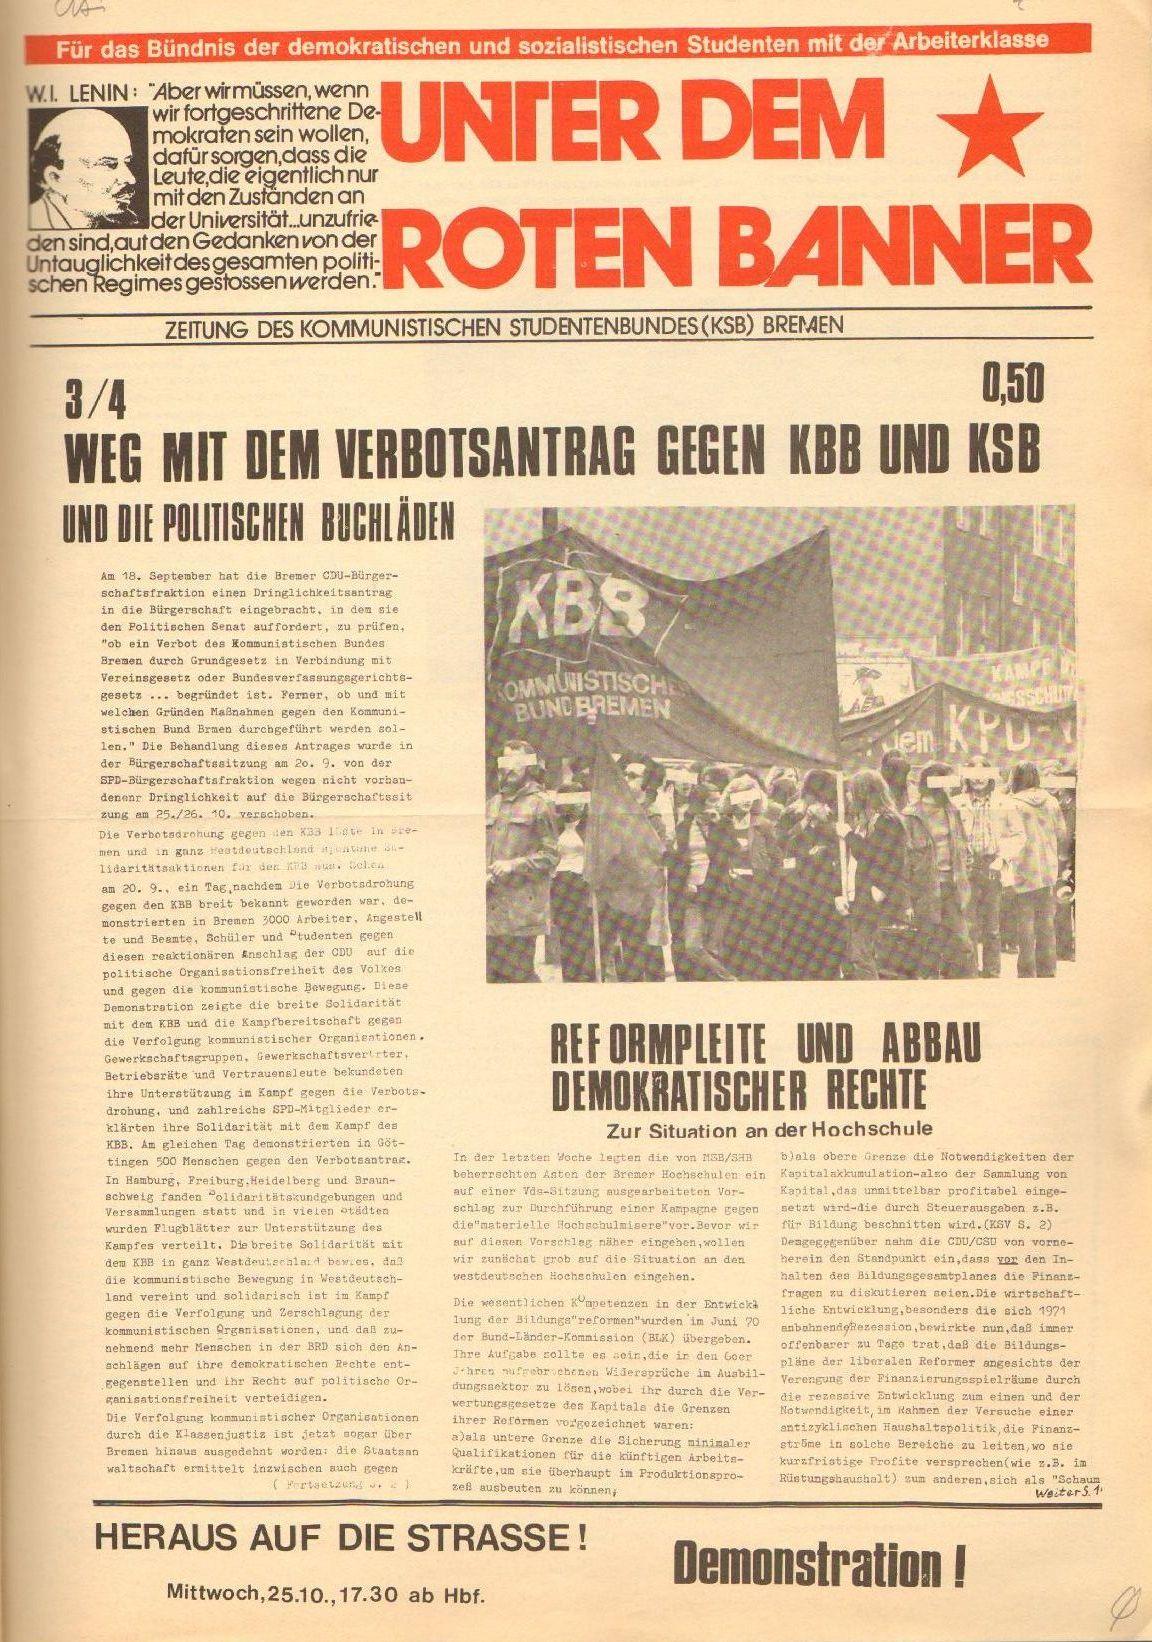 Bremen_Unter_dem_Roten_Banner016